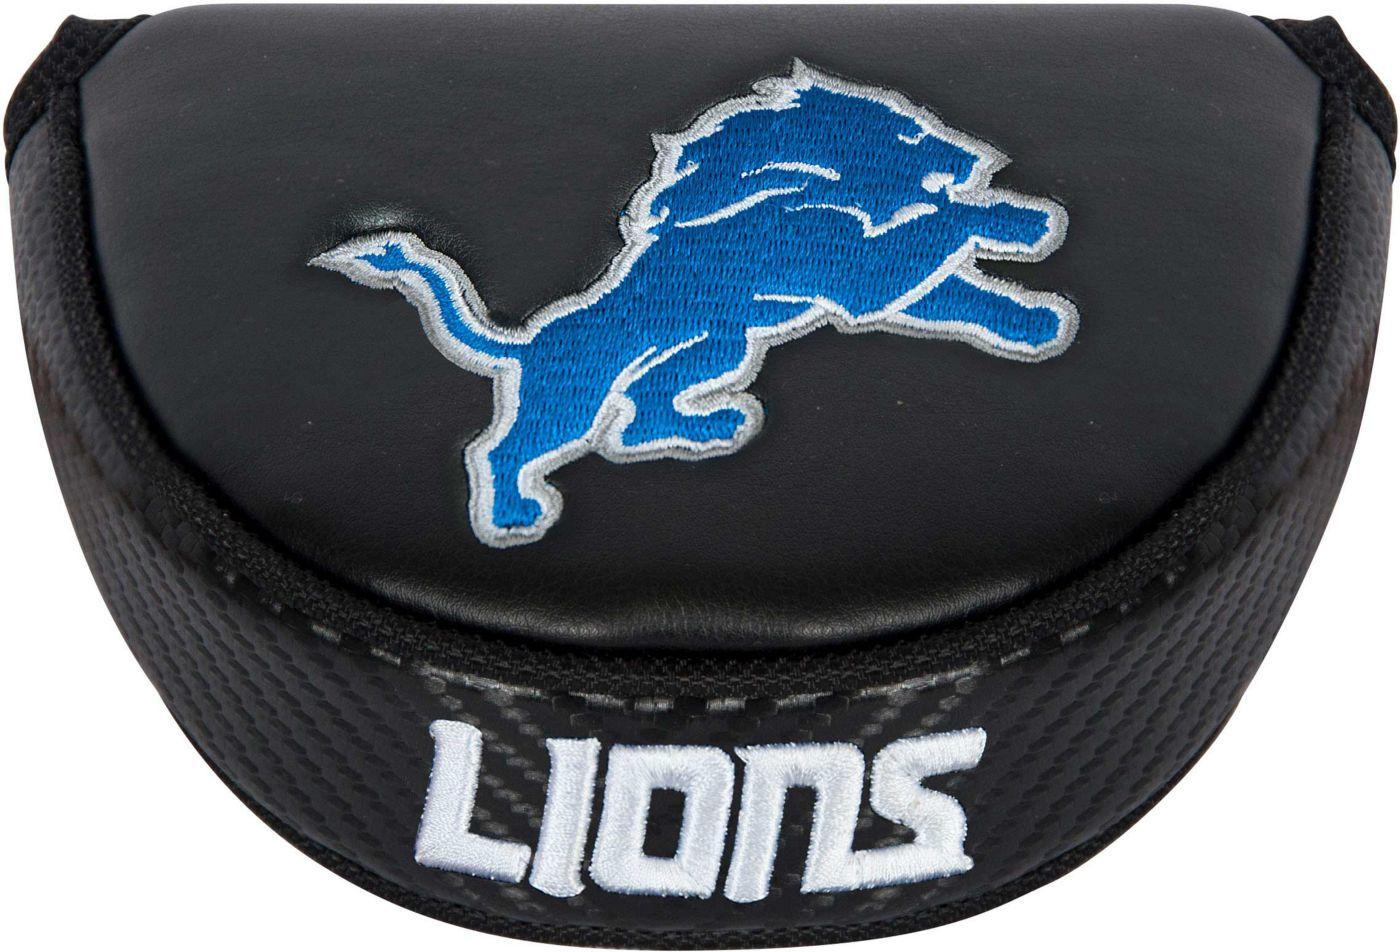 Team Effort Detroit Lions Mallet Putter Headcover